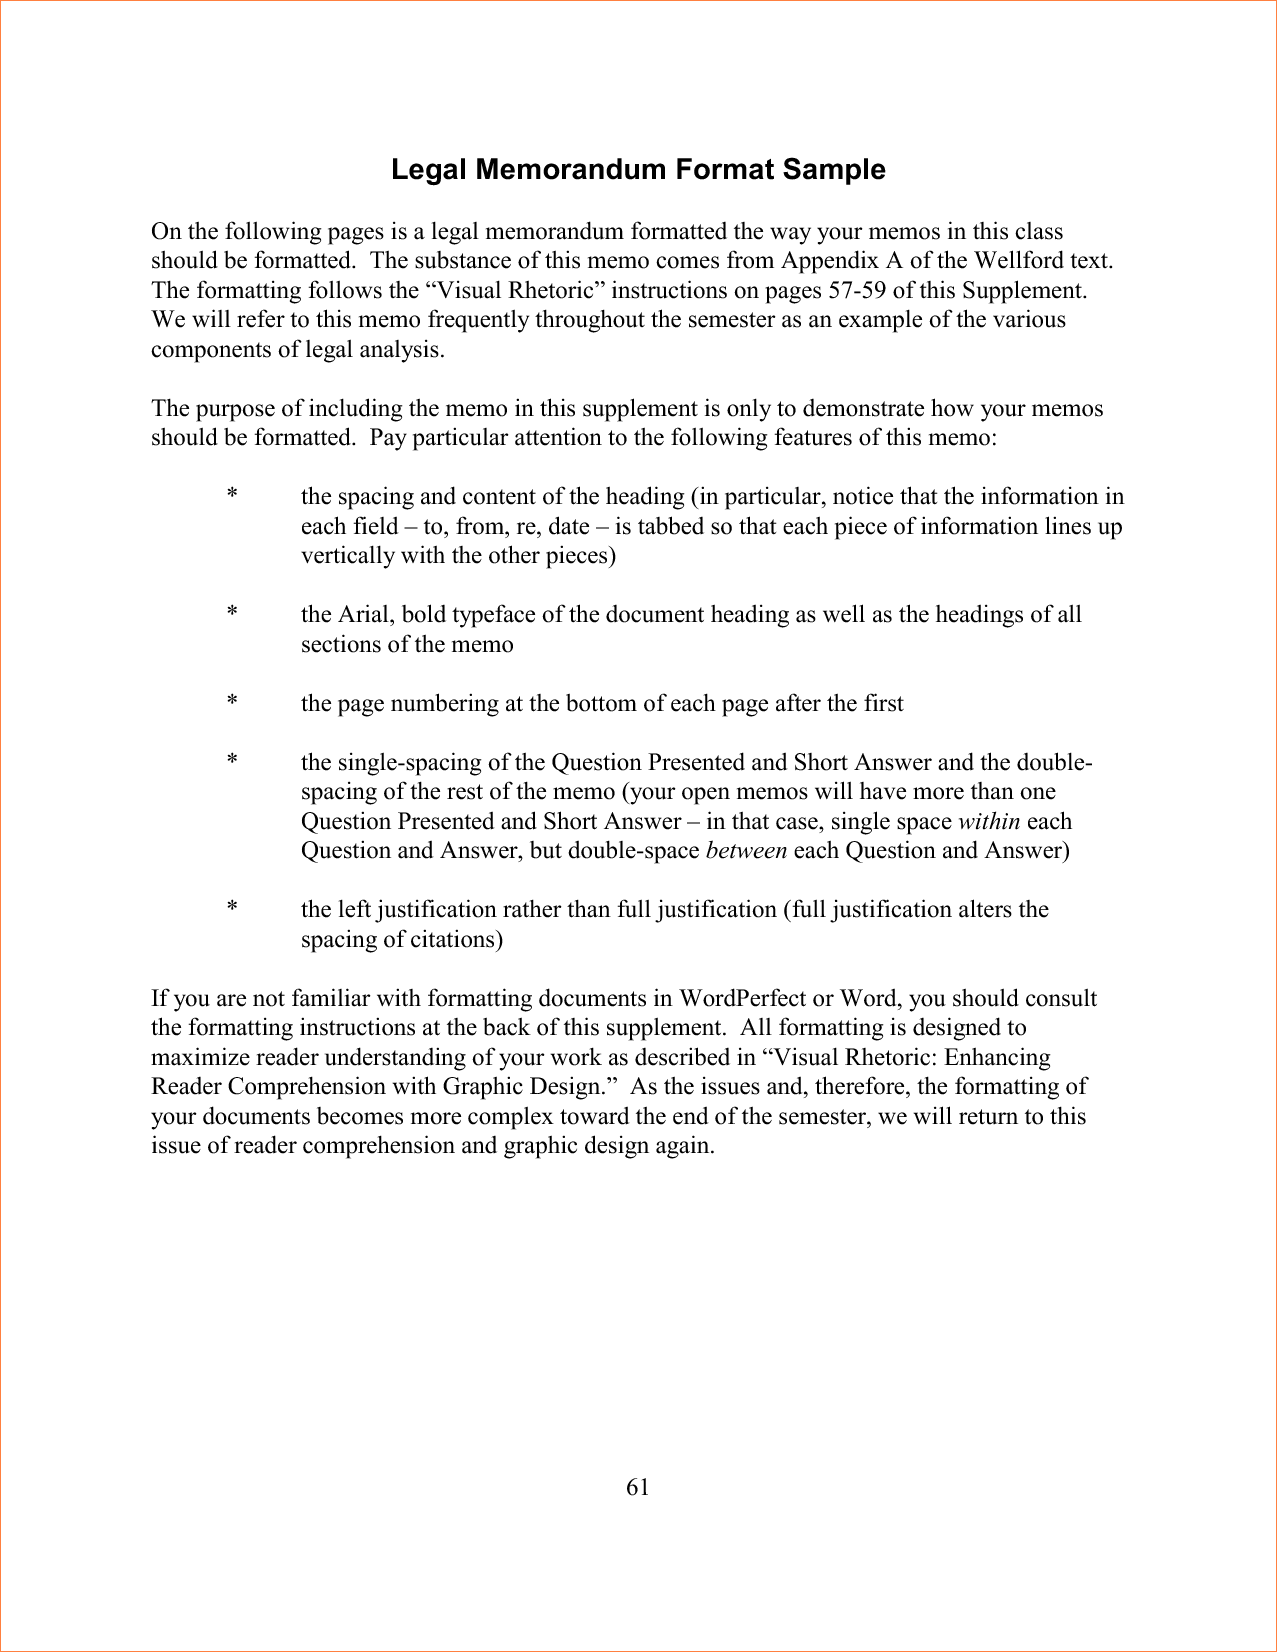 023 Essay Example Respect To Copy Legal Memo Format 4 Surprising Full